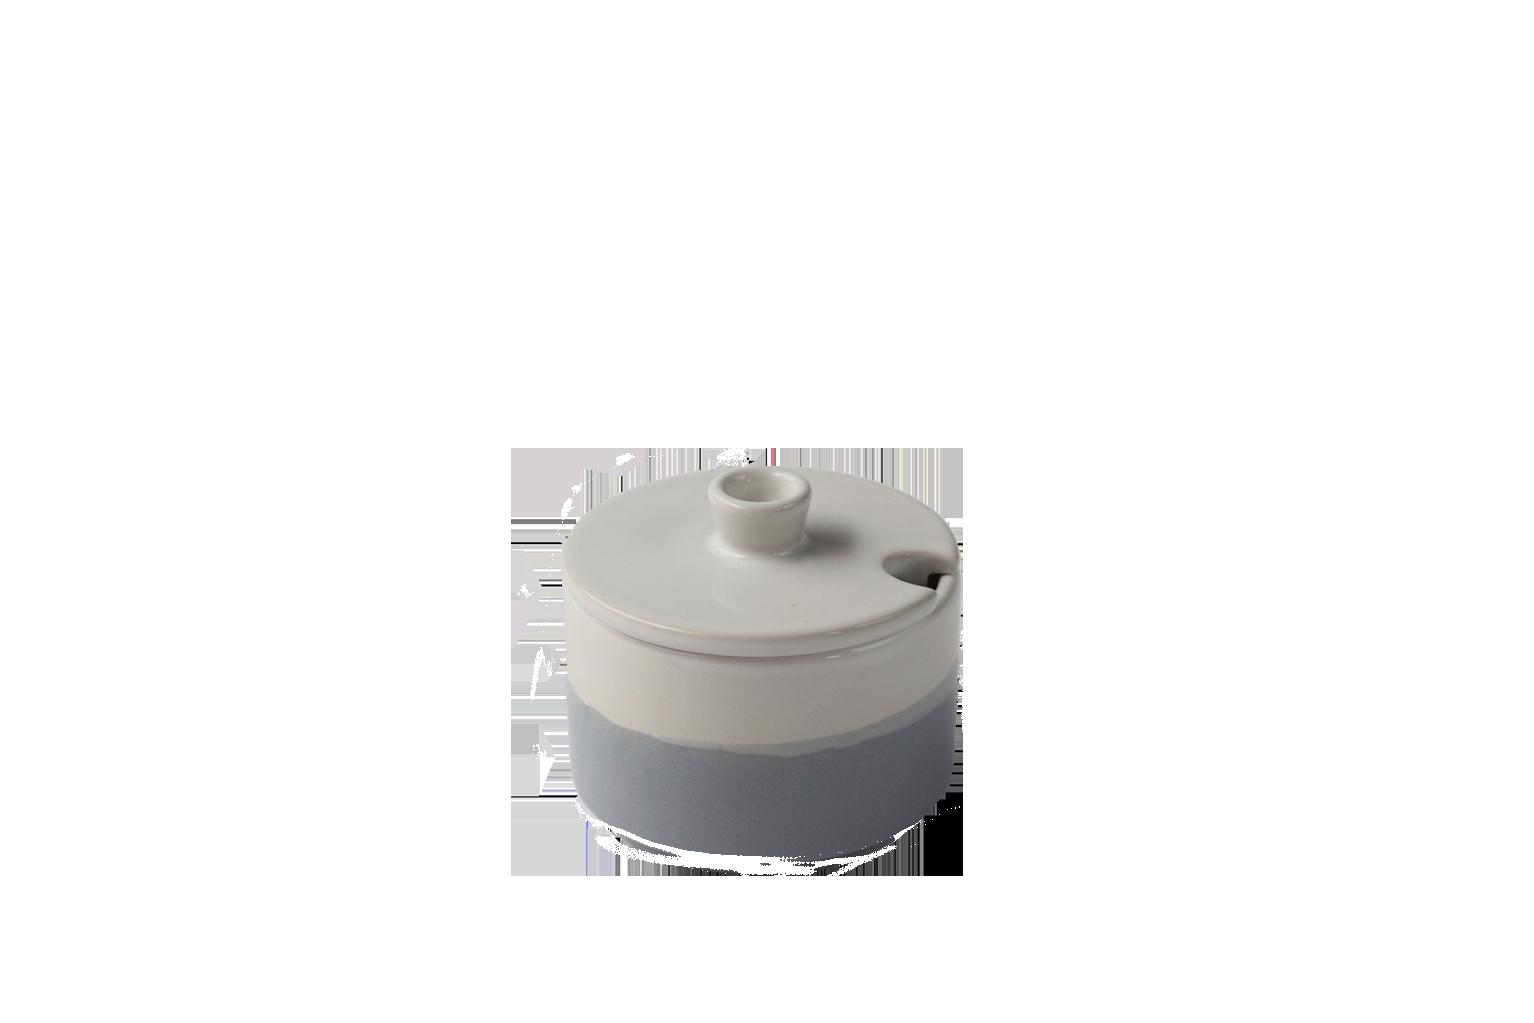 Ceramic Sugar Bowl - S$95